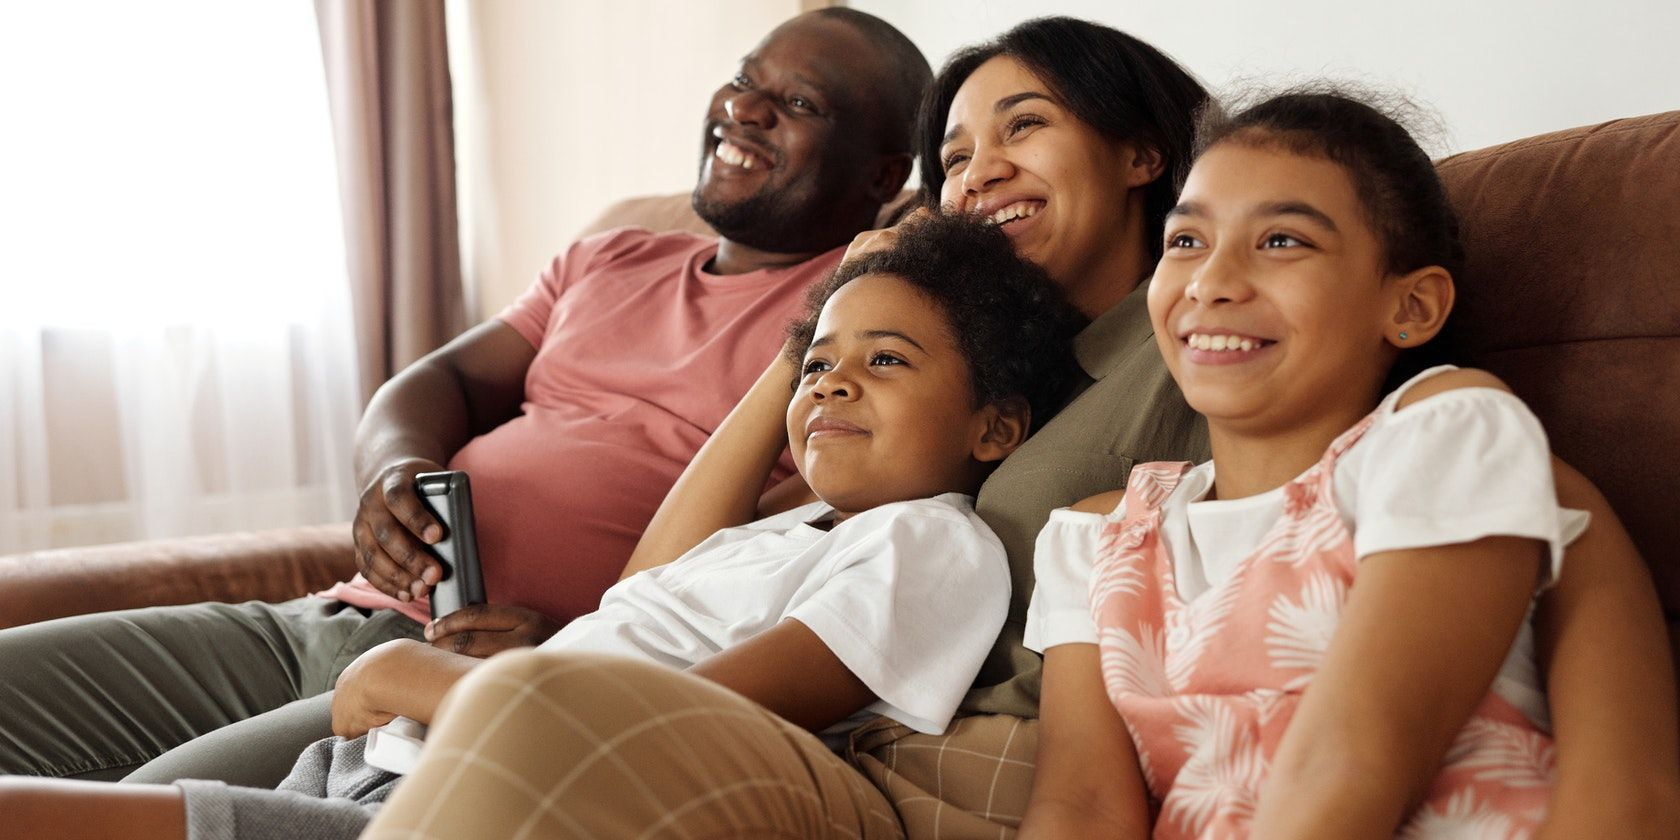 The 9 Best Ways to Stream Spanish TV Channels